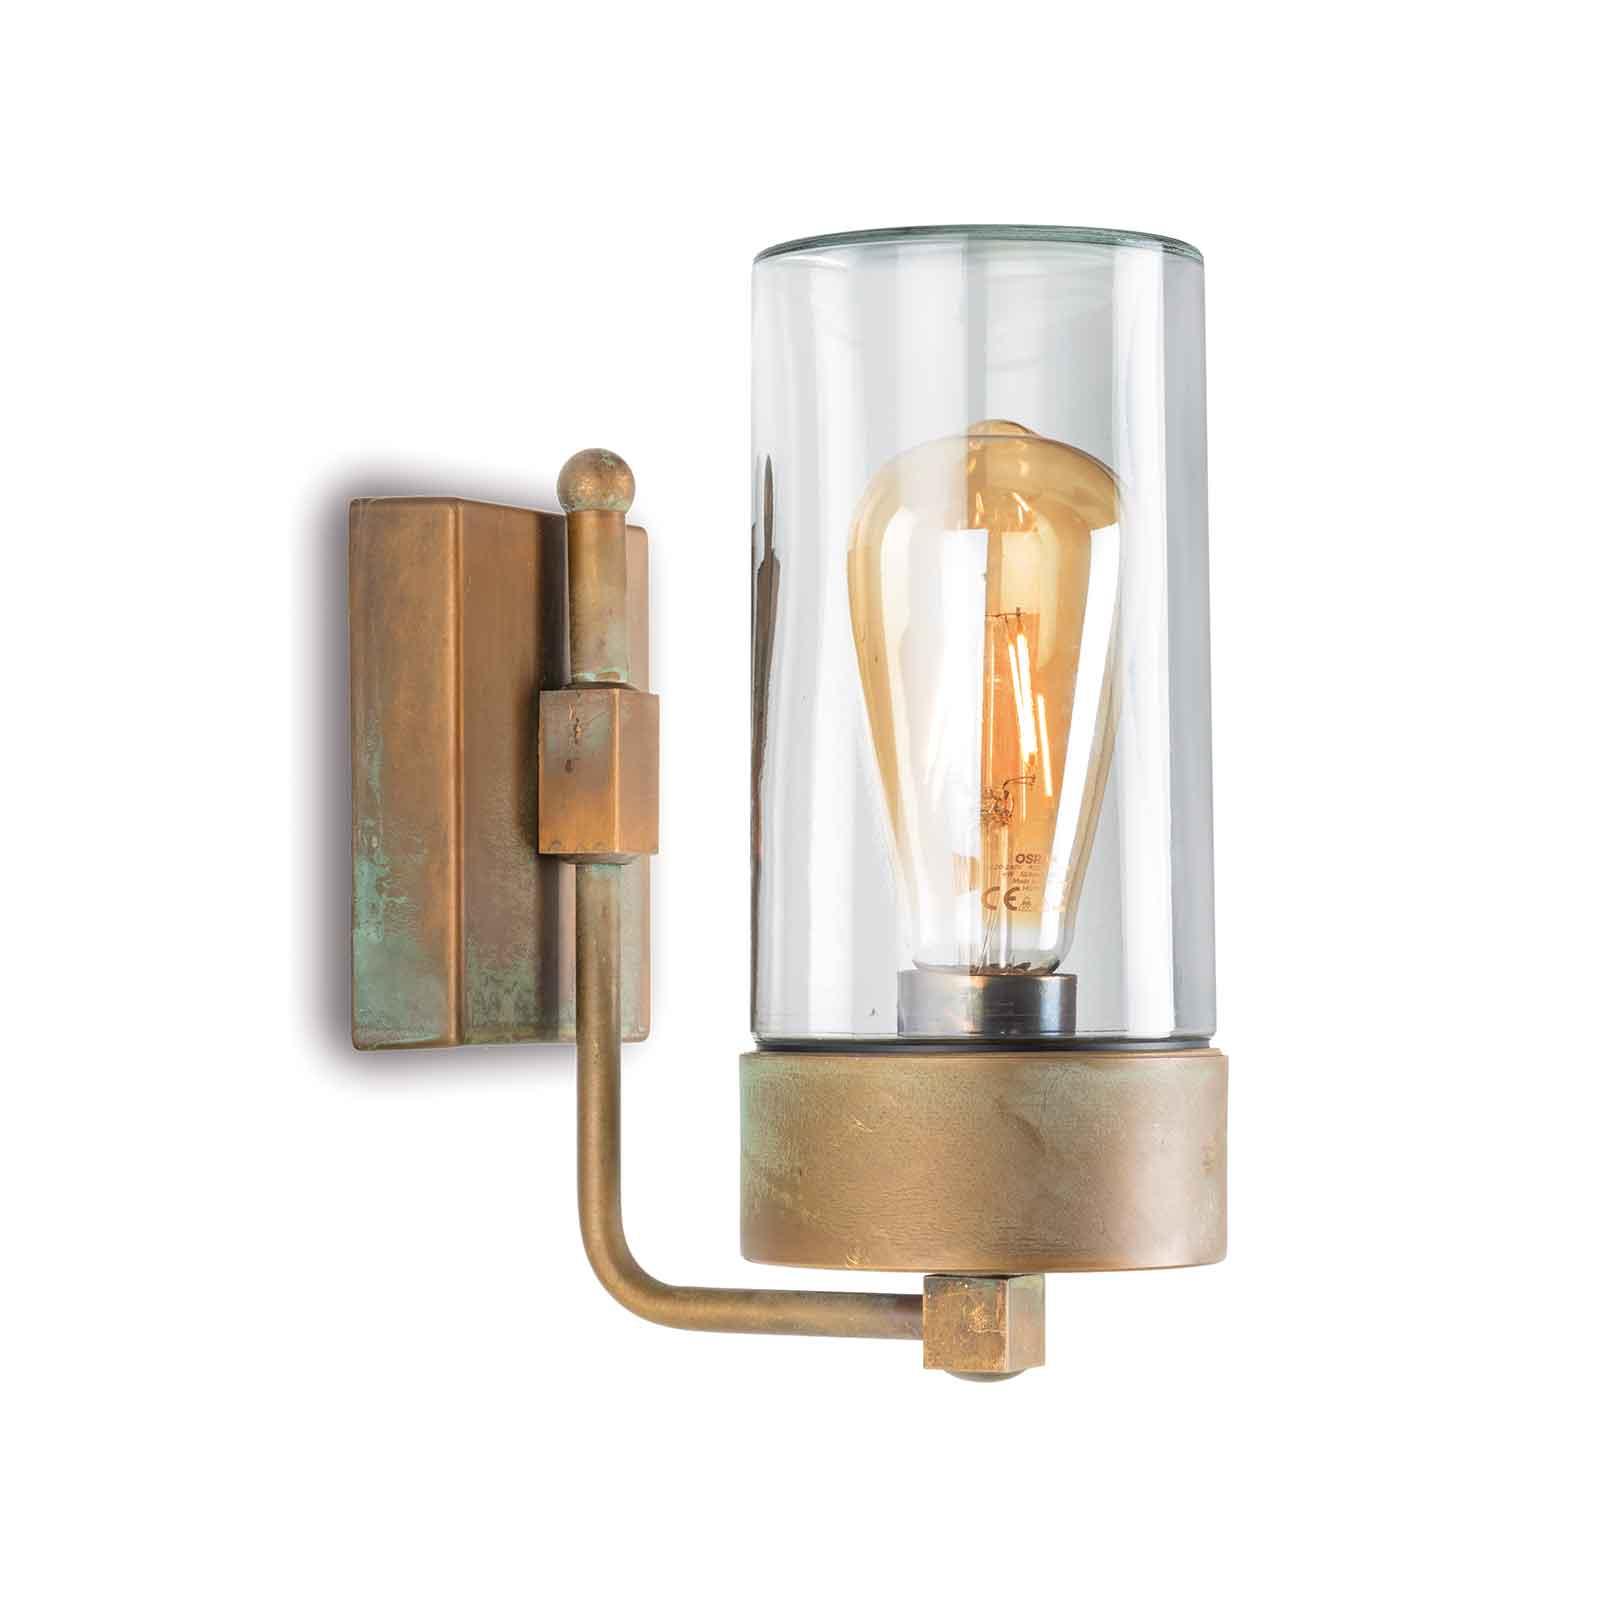 Buitenwandlamp Silindar 3390,messing antiek/helder